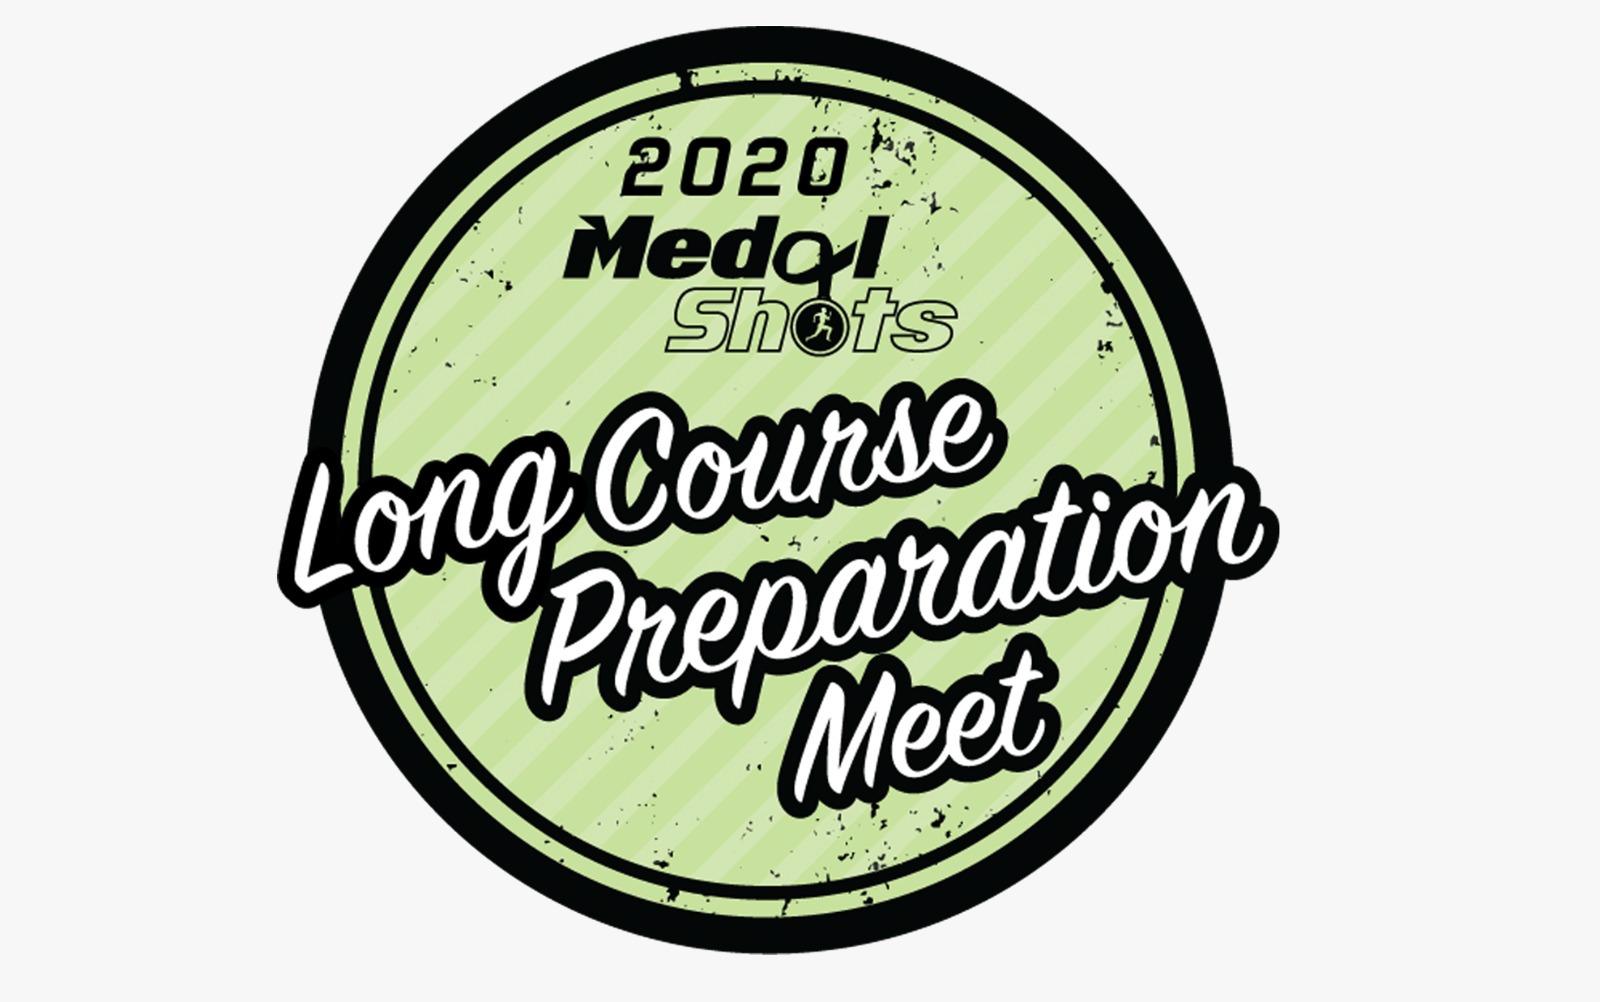 Replay - 2020 Medal Shots Long Course Preparation Meet